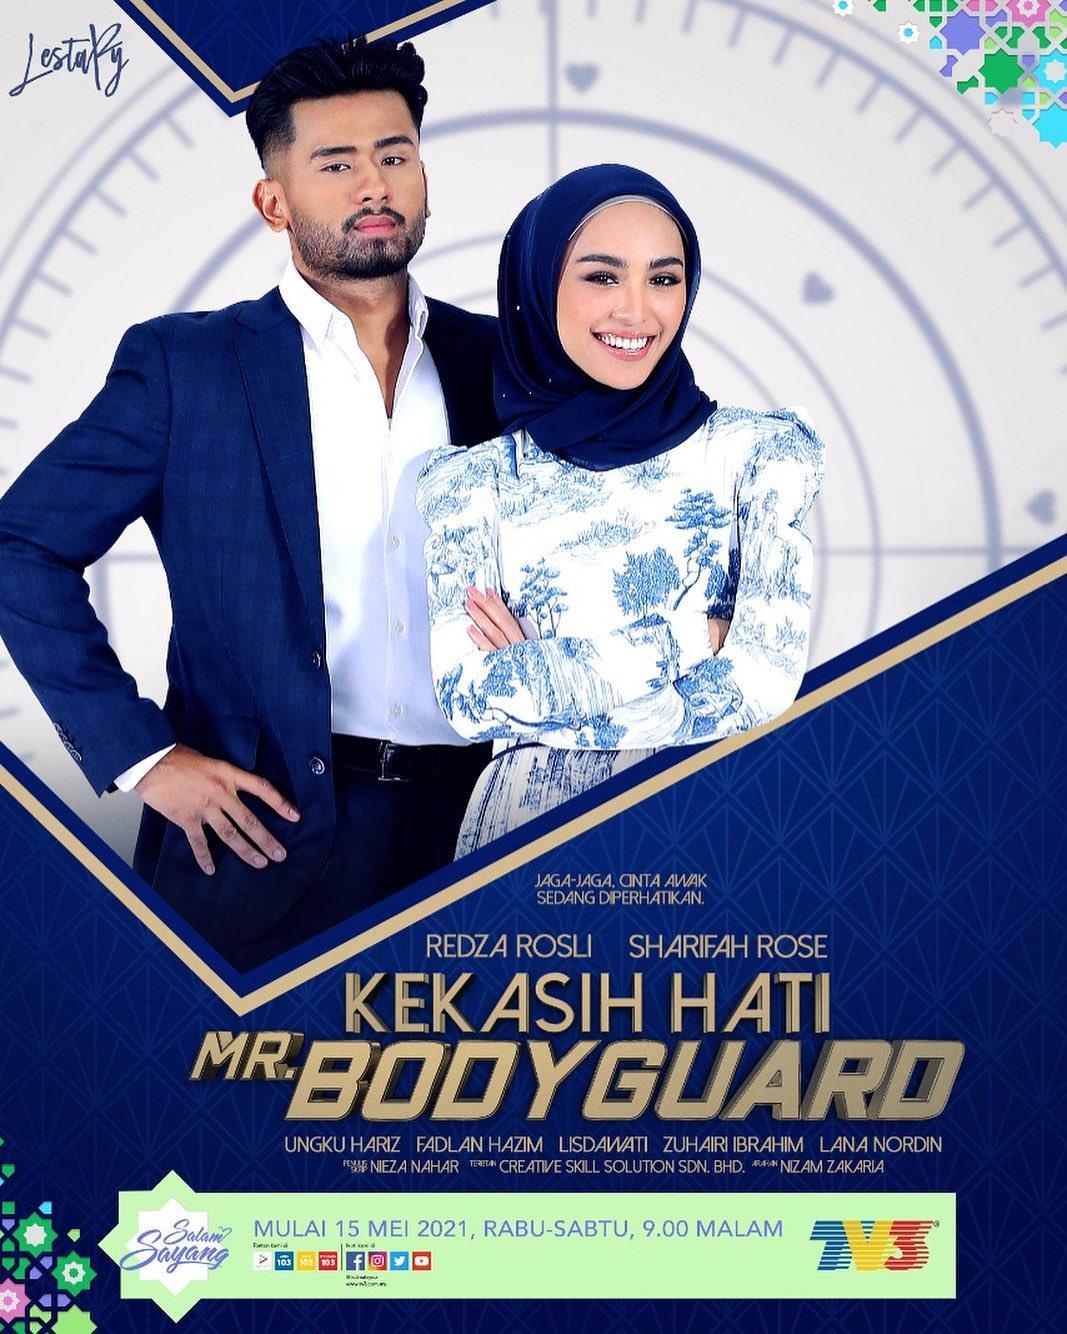 Drama Kekasih Hati Mr Bodyguard